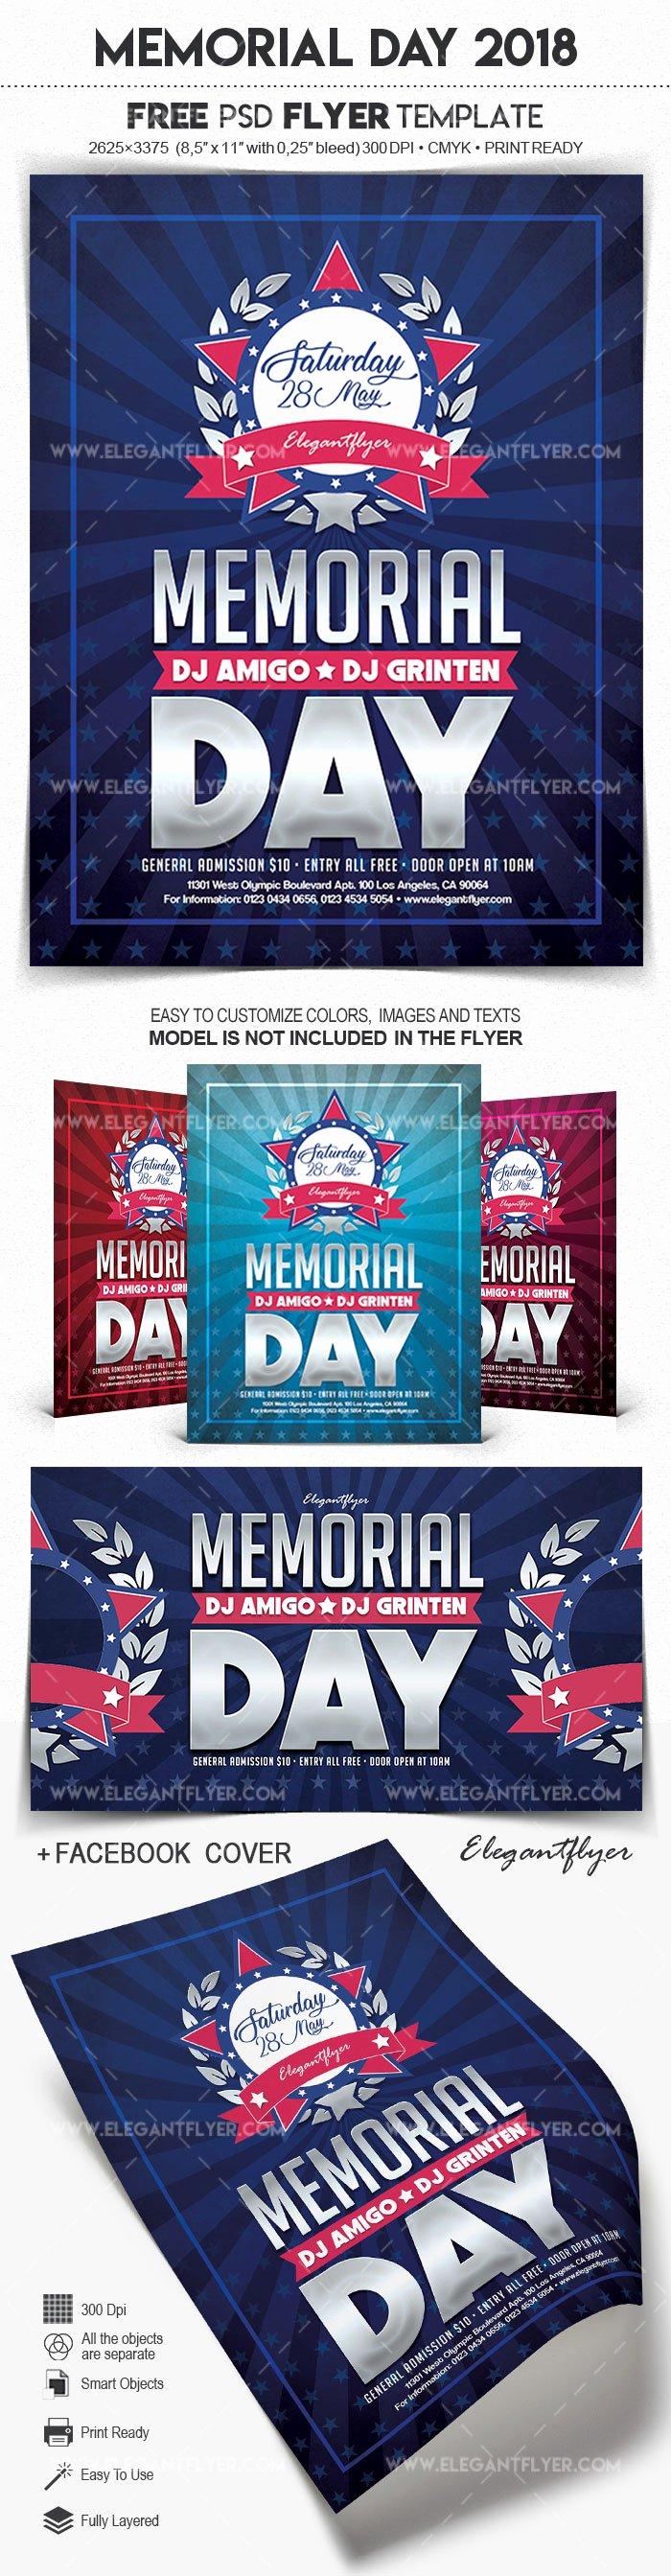 Memorial Day Flyer Template Free Elegant Memorial Day 2018 – Free Flyer Psd Template – by Elegantflyer